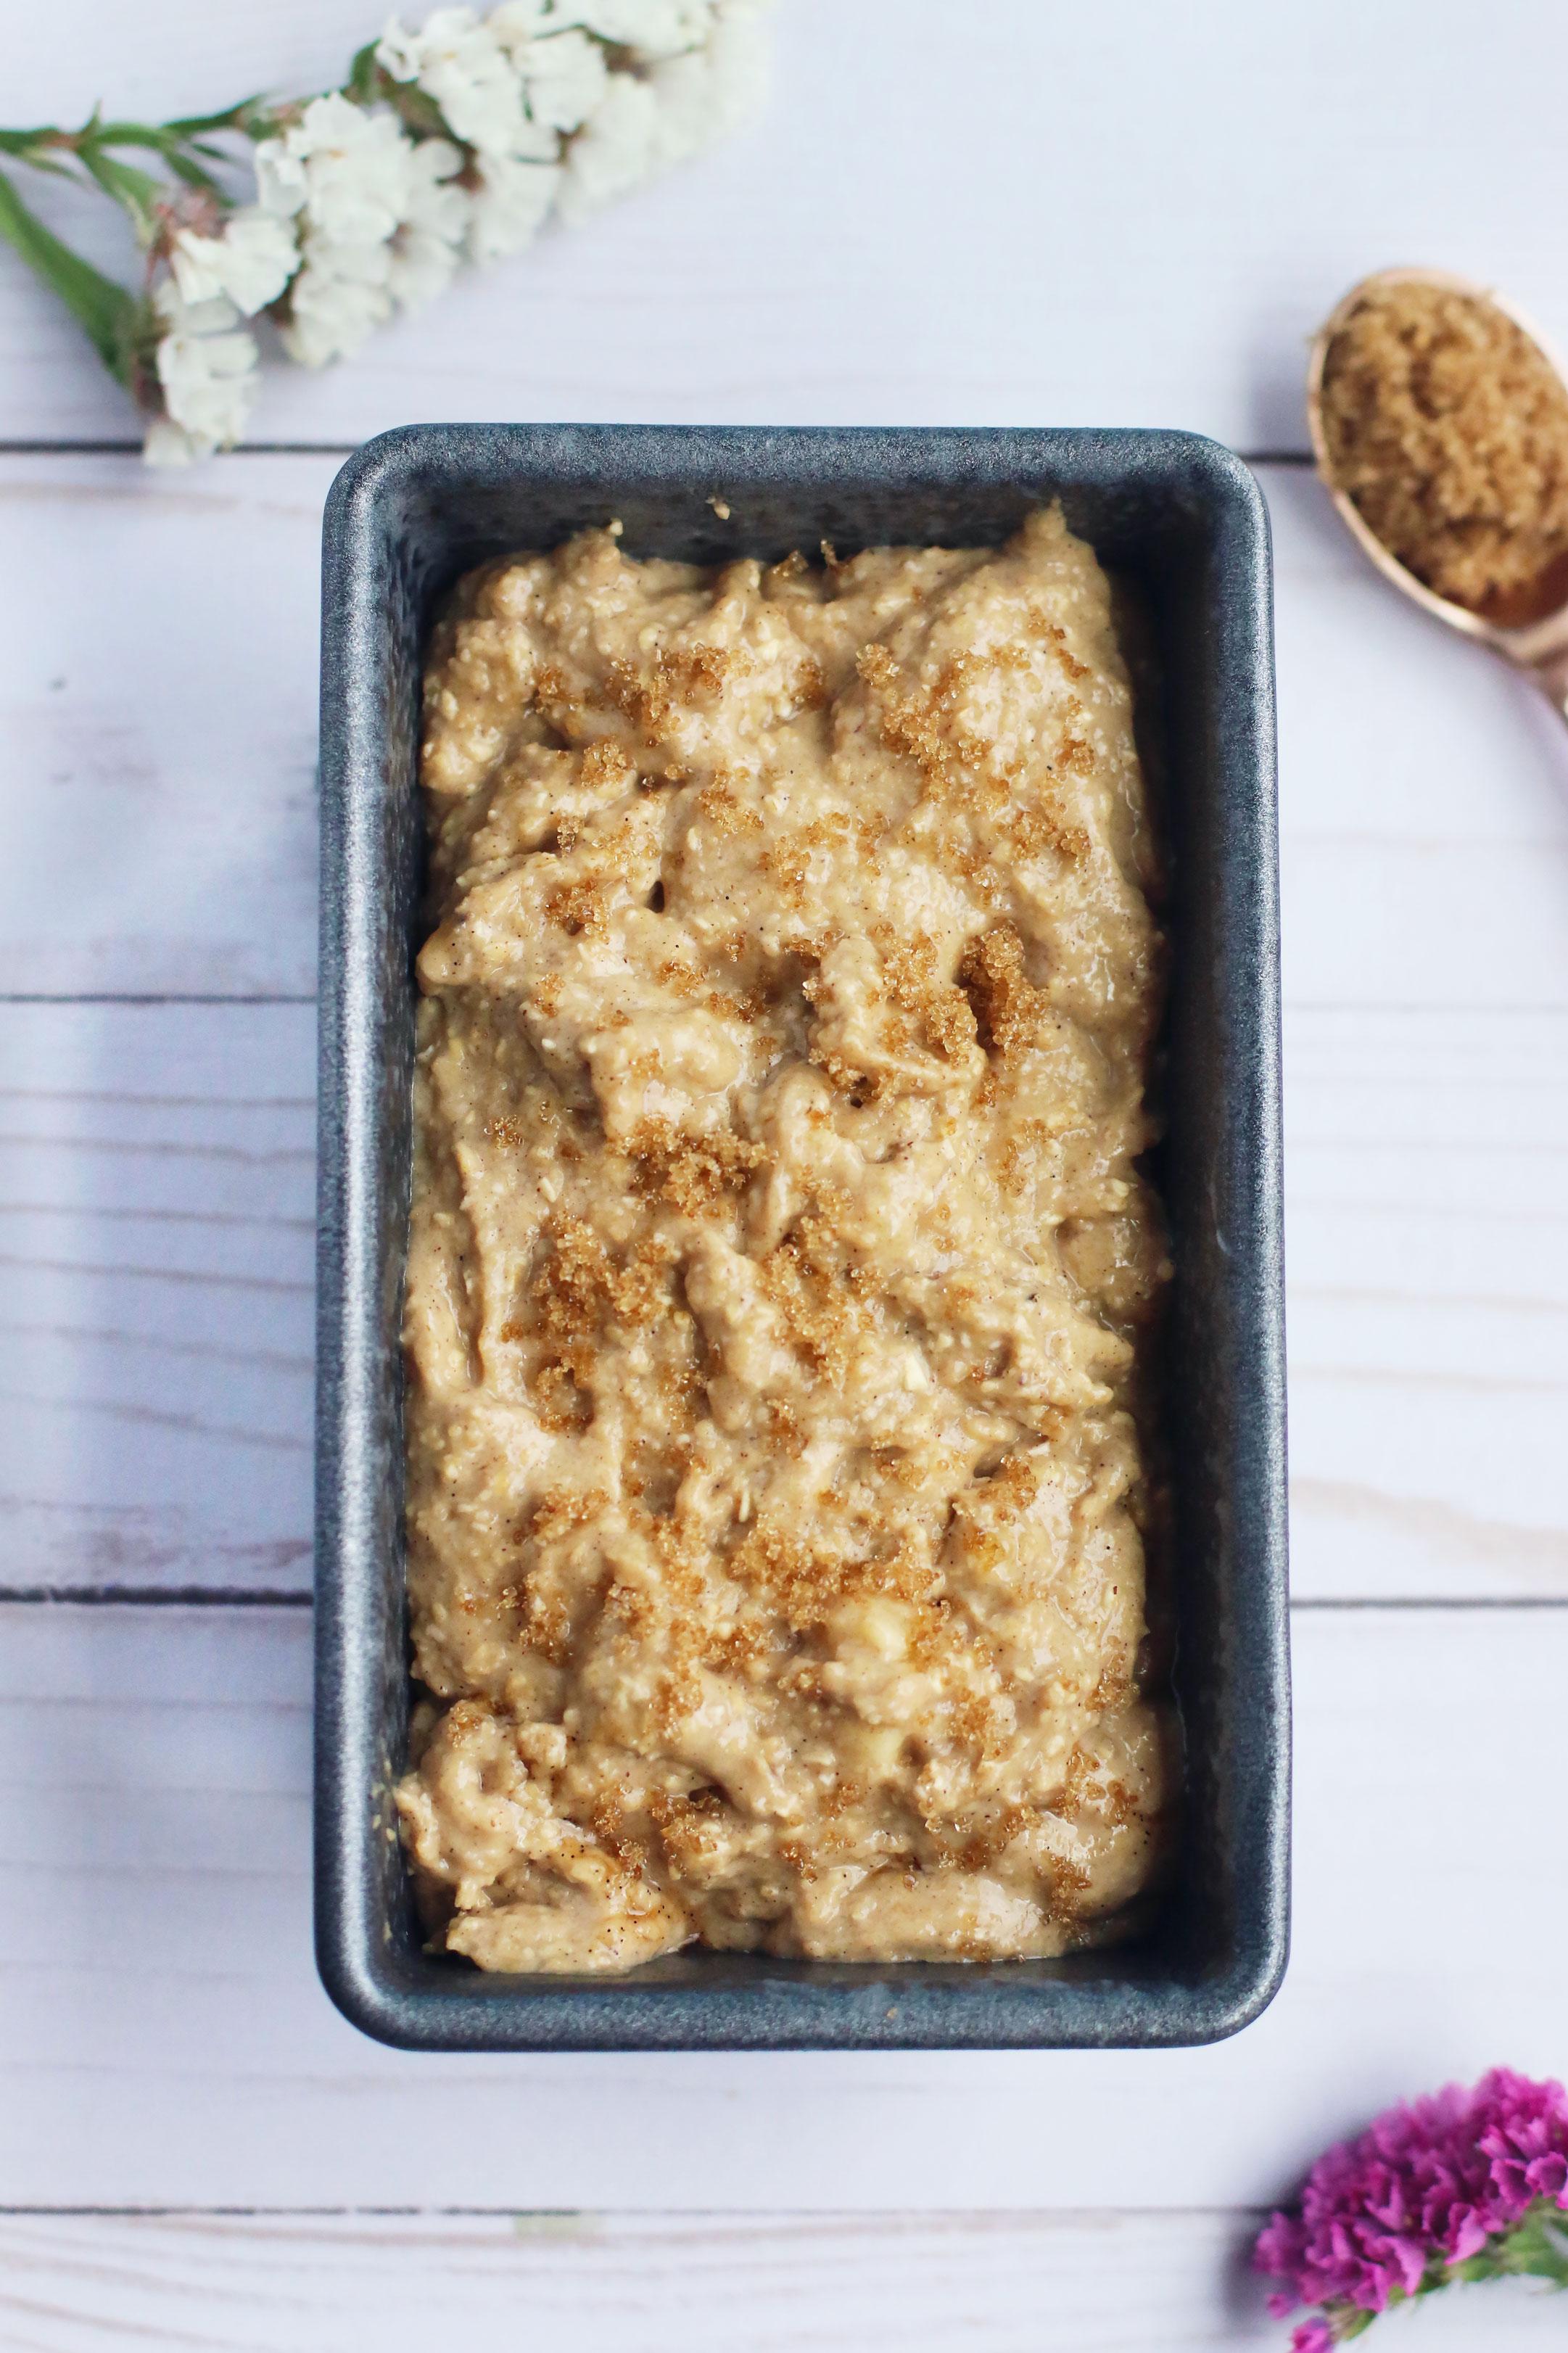 thug-kitchen-vegan-maple-oat-banana-bread-step